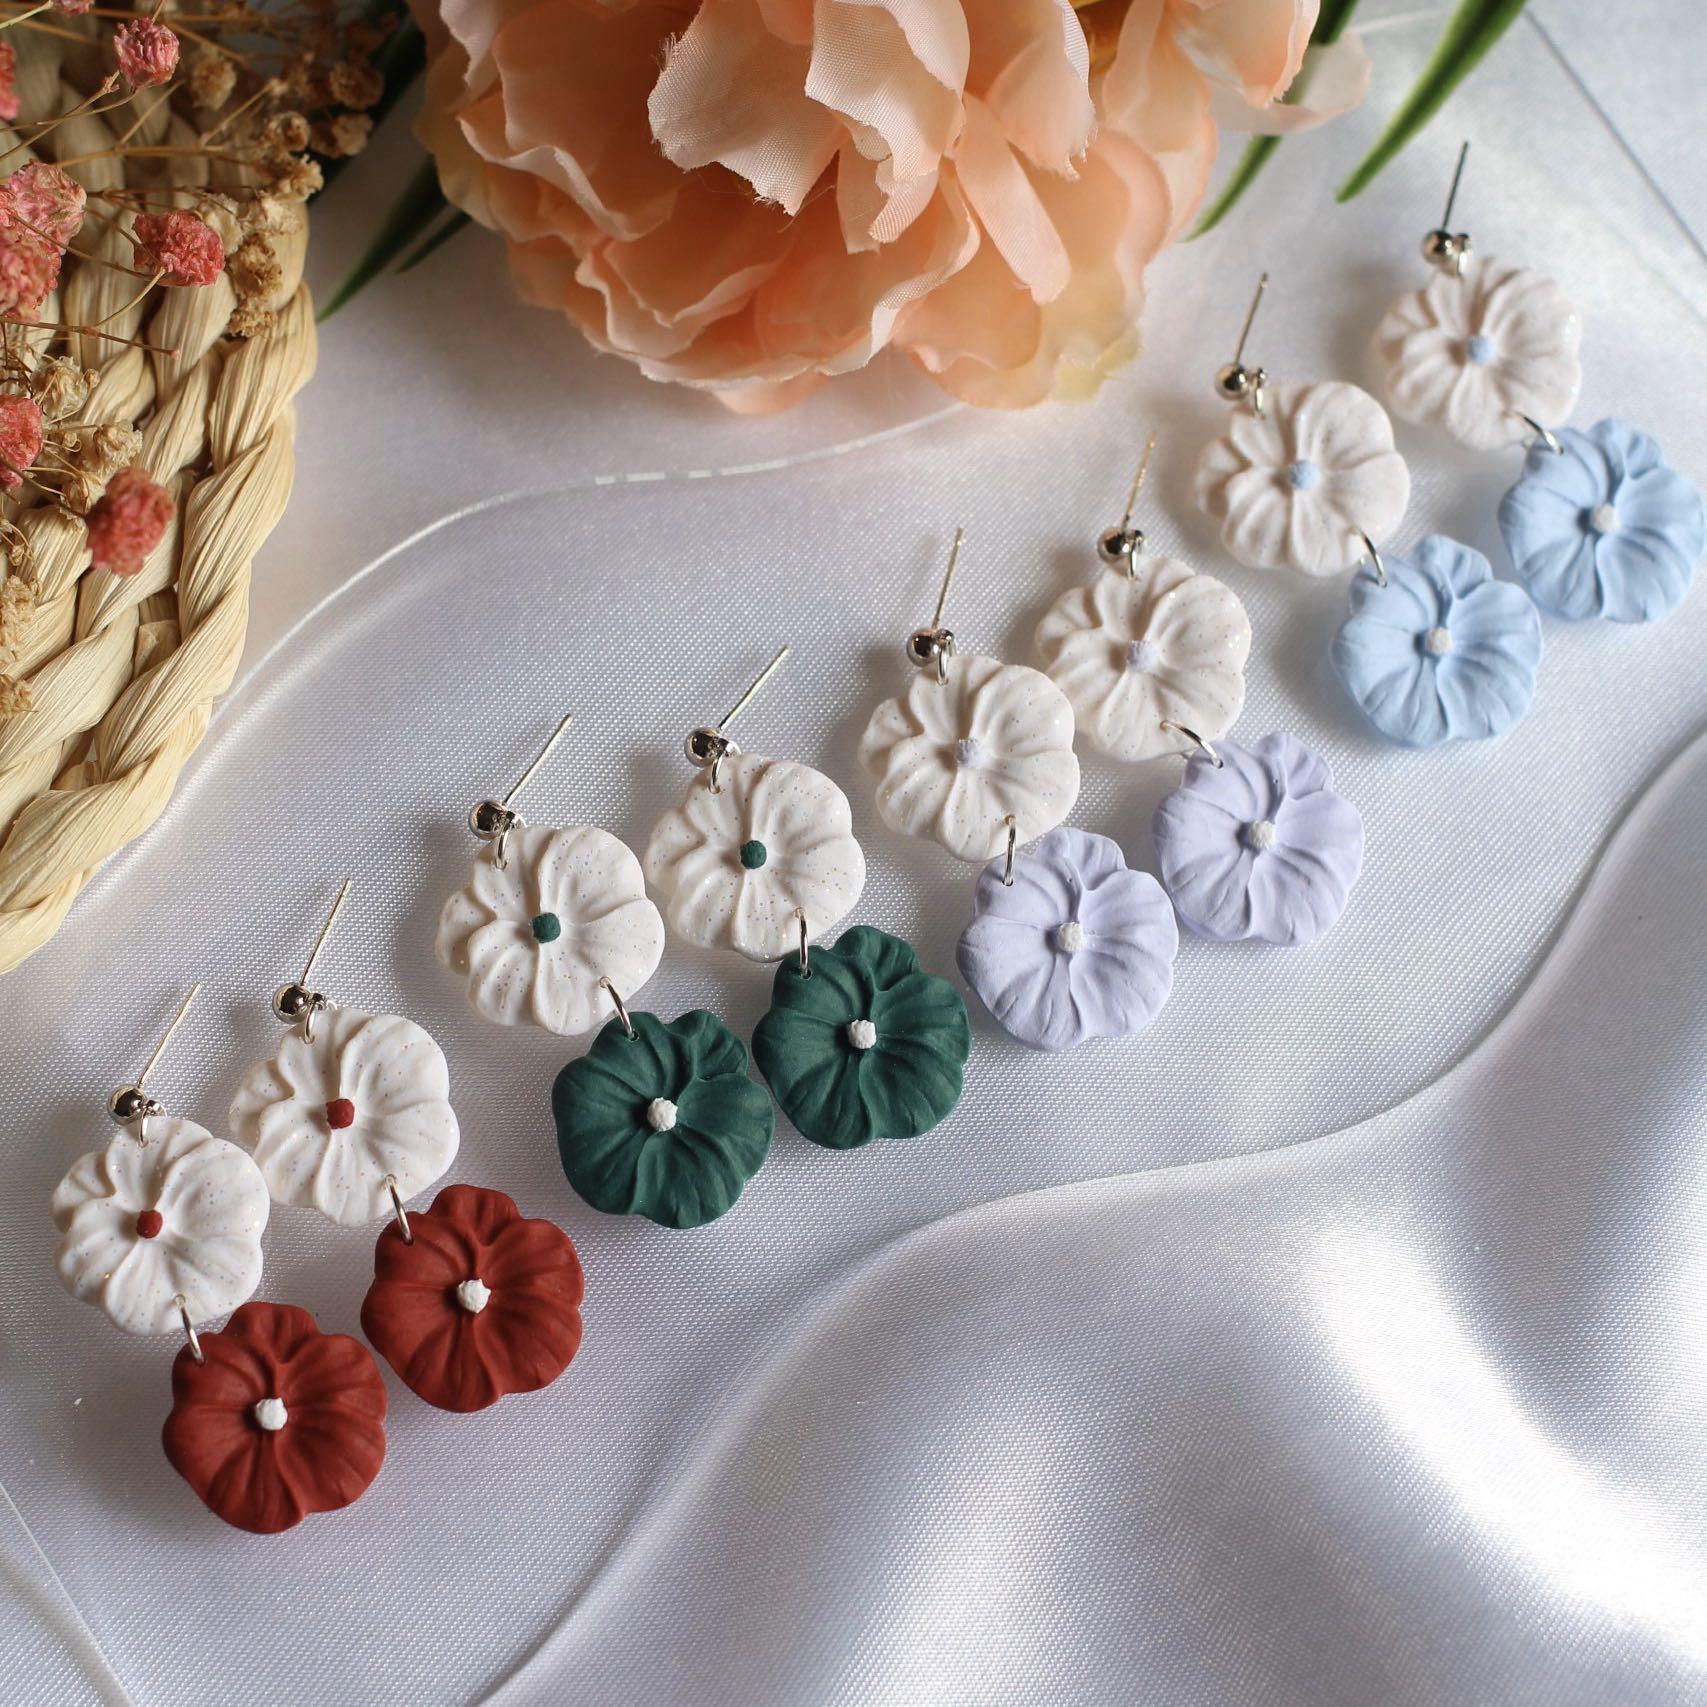 Polymer Clay Earrings Floral Dangle Earrings Clay Earrings Pink Ombre Rose with leaves Earrings Rose Statement Earrings Handmade